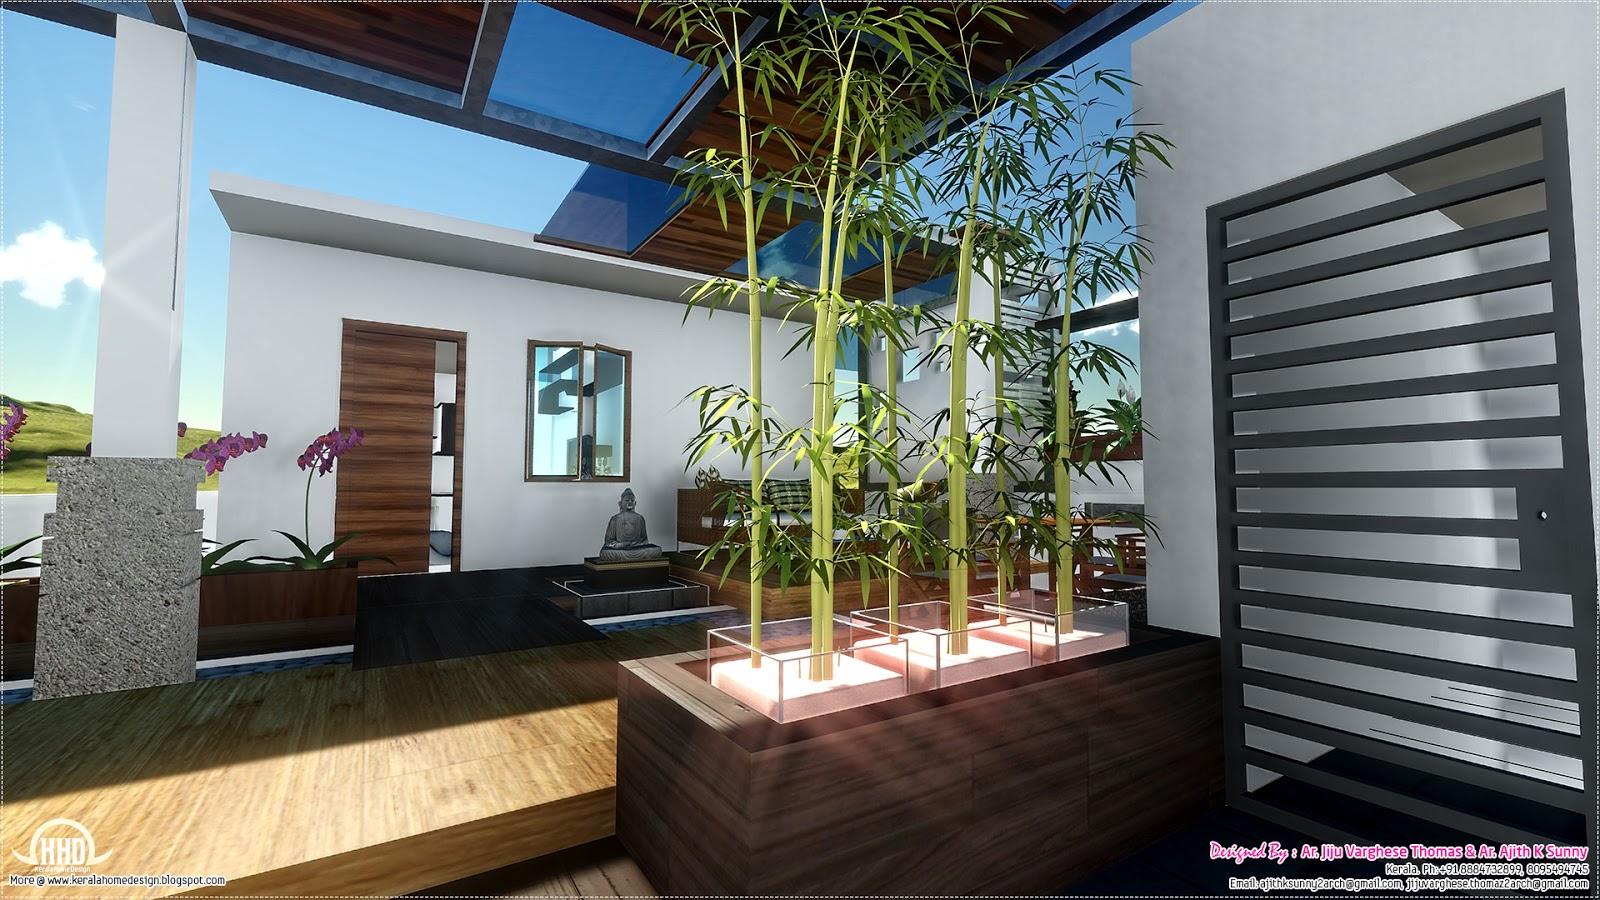 Contemporary style home landscape design in 800 kerala home design and floor plans - Square meter garden design ideas ...